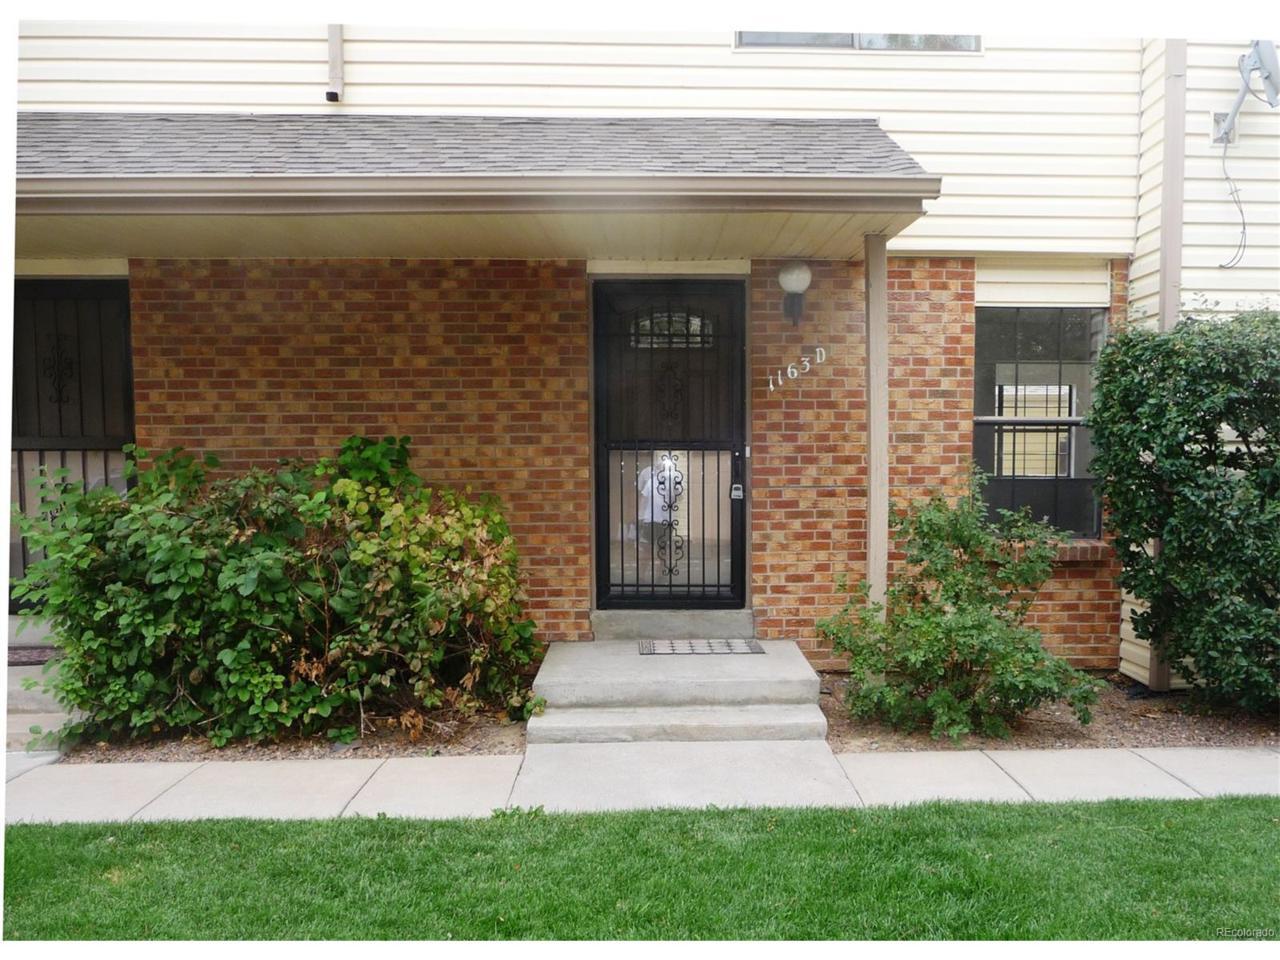 1163 S Sable Boulevard D, Aurora, CO 80012 (MLS #7847960) :: 8z Real Estate